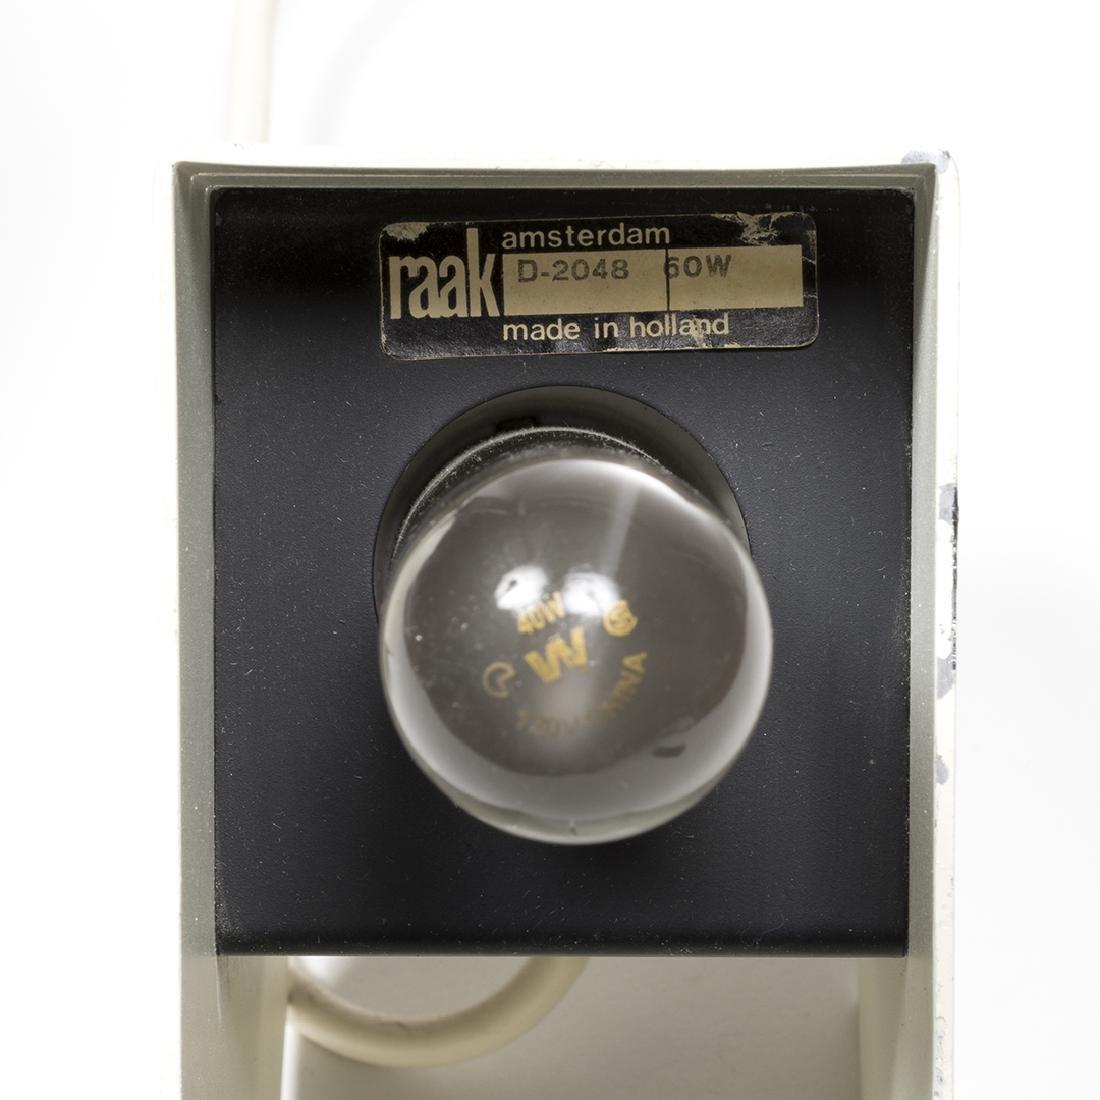 Raak Table Lamps (2) - 6